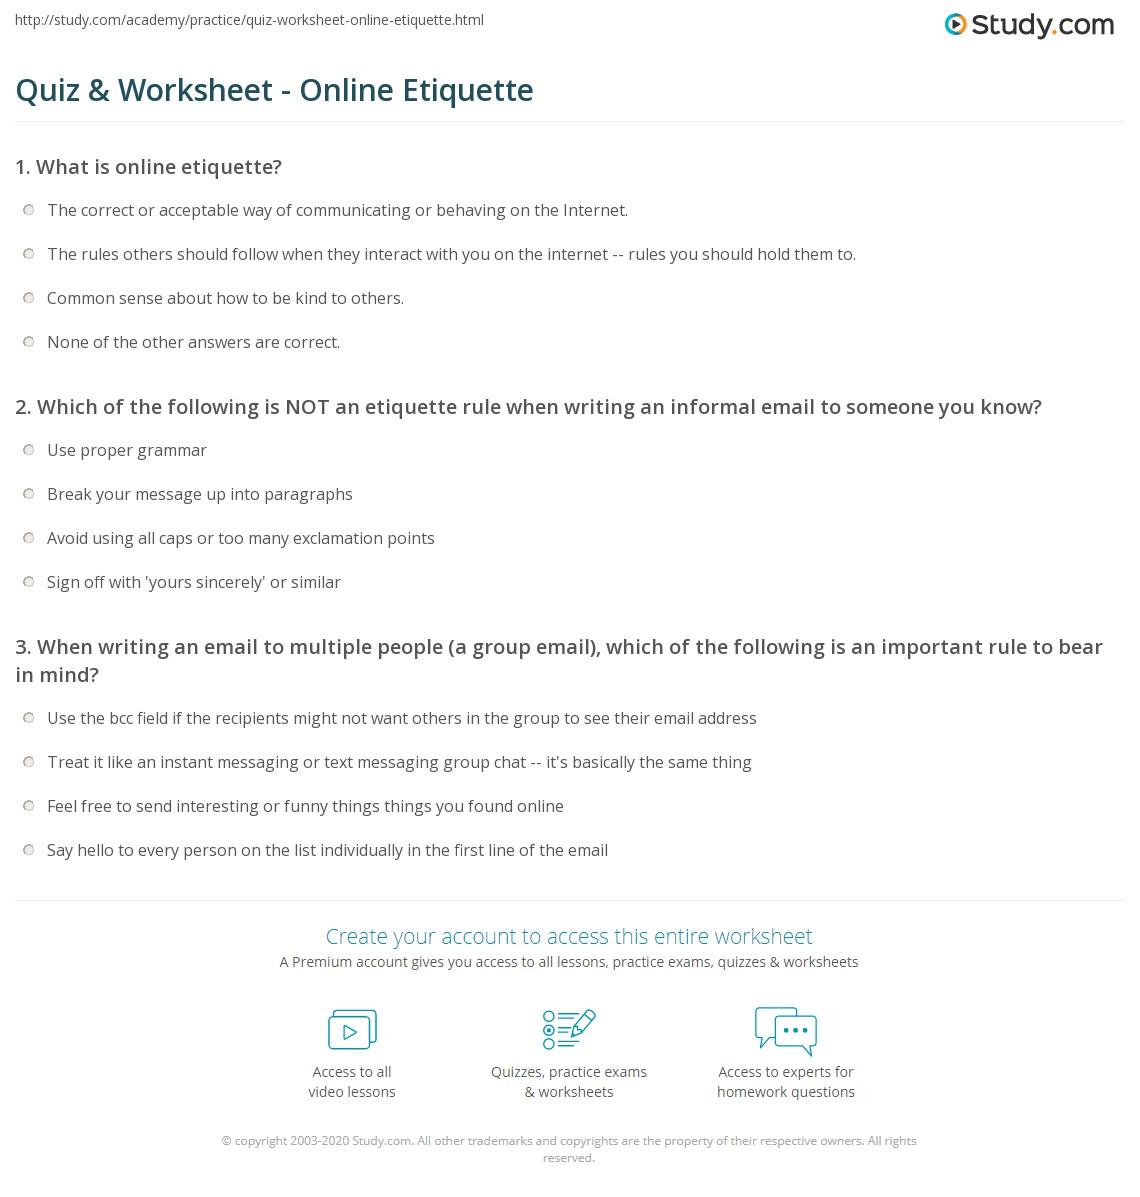 Quiz & Worksheet - Online Etiquette | Study.com